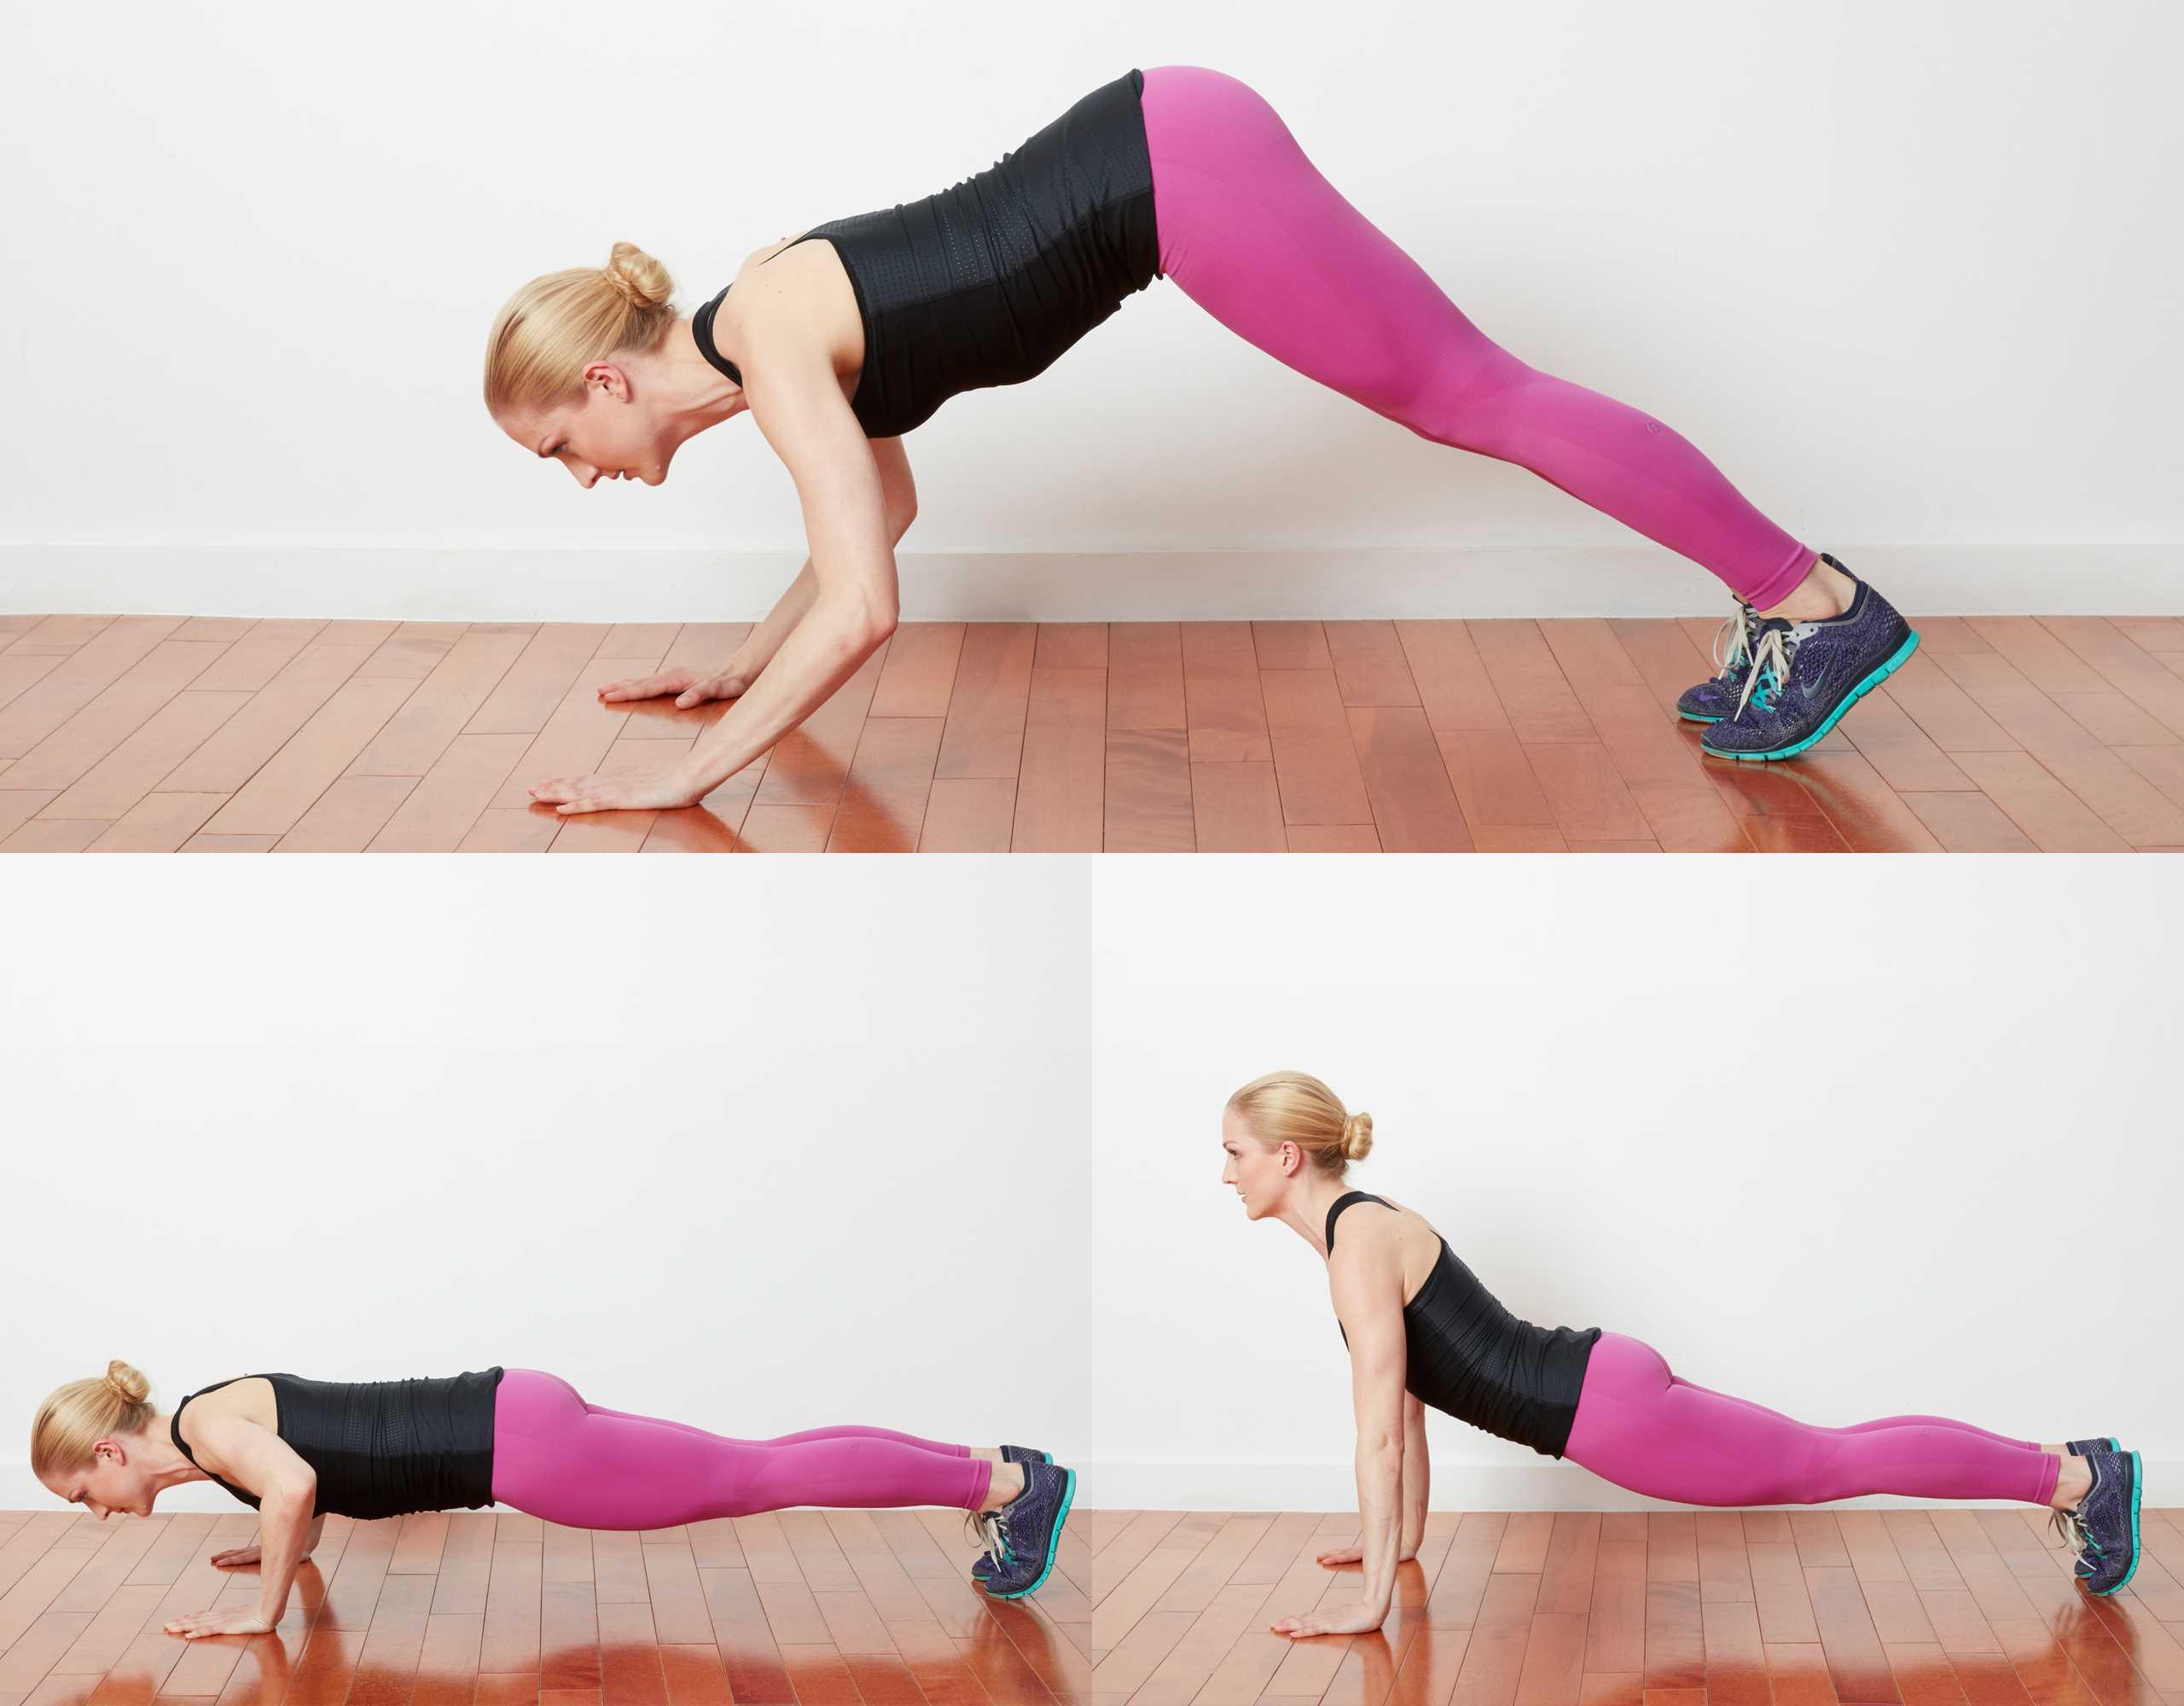 Woman doing divebomber pushups